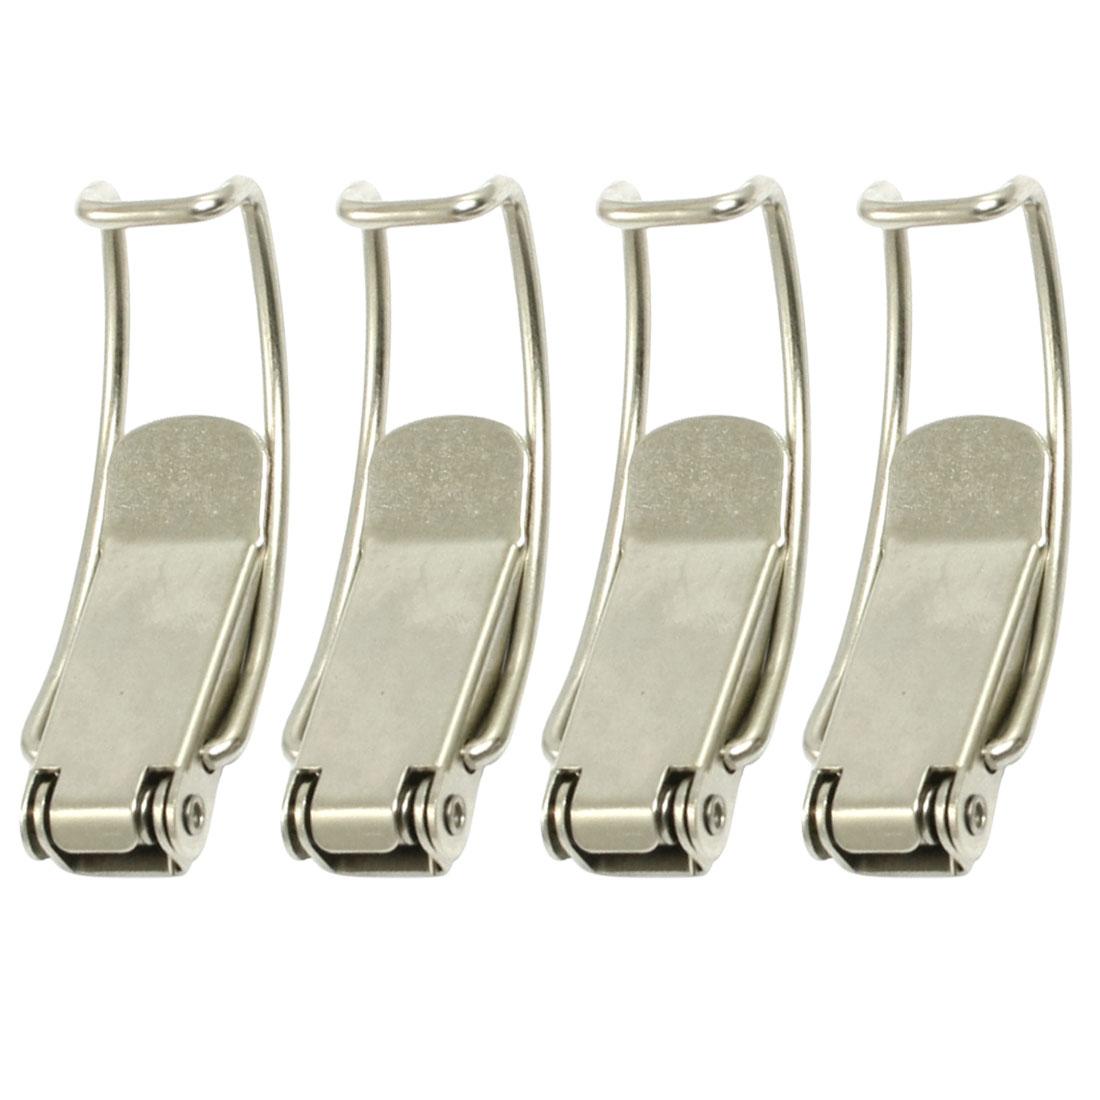 UXCELL Hot Sale 4 Pcs/lot 4mm Hole Dia Box Chest Case Spring Loaded Draw Toggle Latch 8.5 x 2.3 x 1.5cm Silver Tone лупа 20pcs lot 45 x 45 x 2led 10699